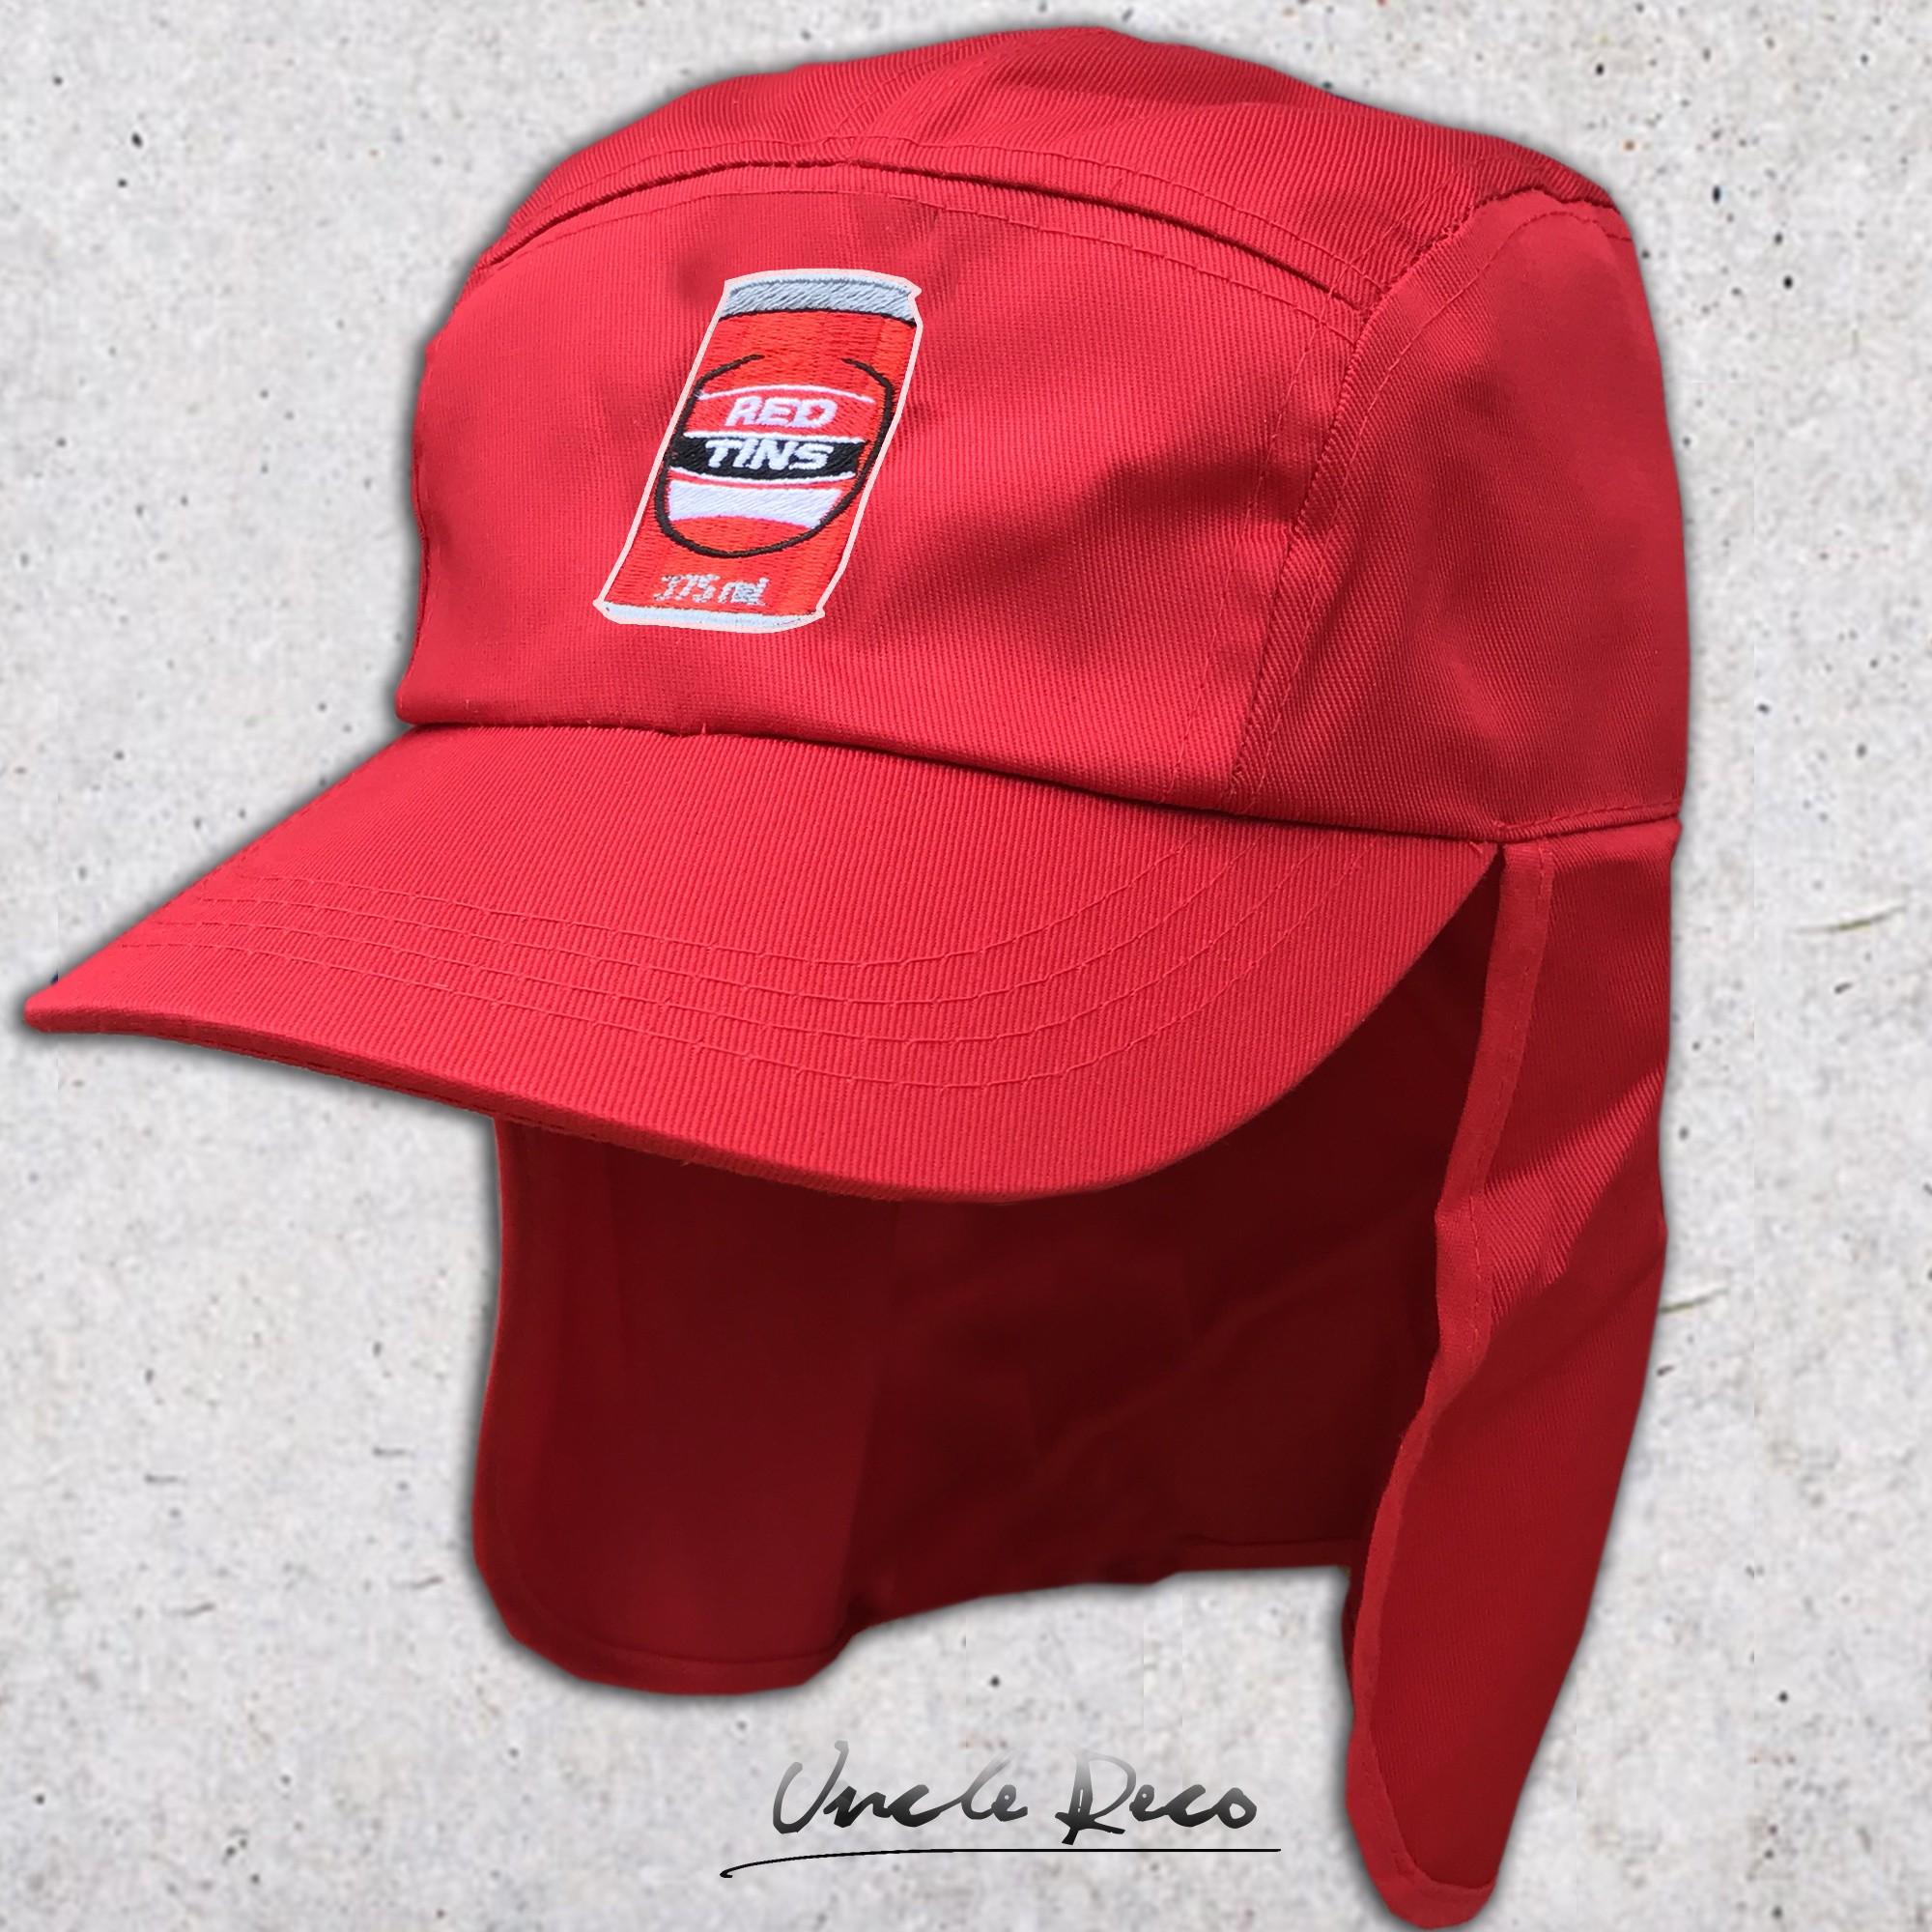 RED TINS LEGIONNAIRES HAT